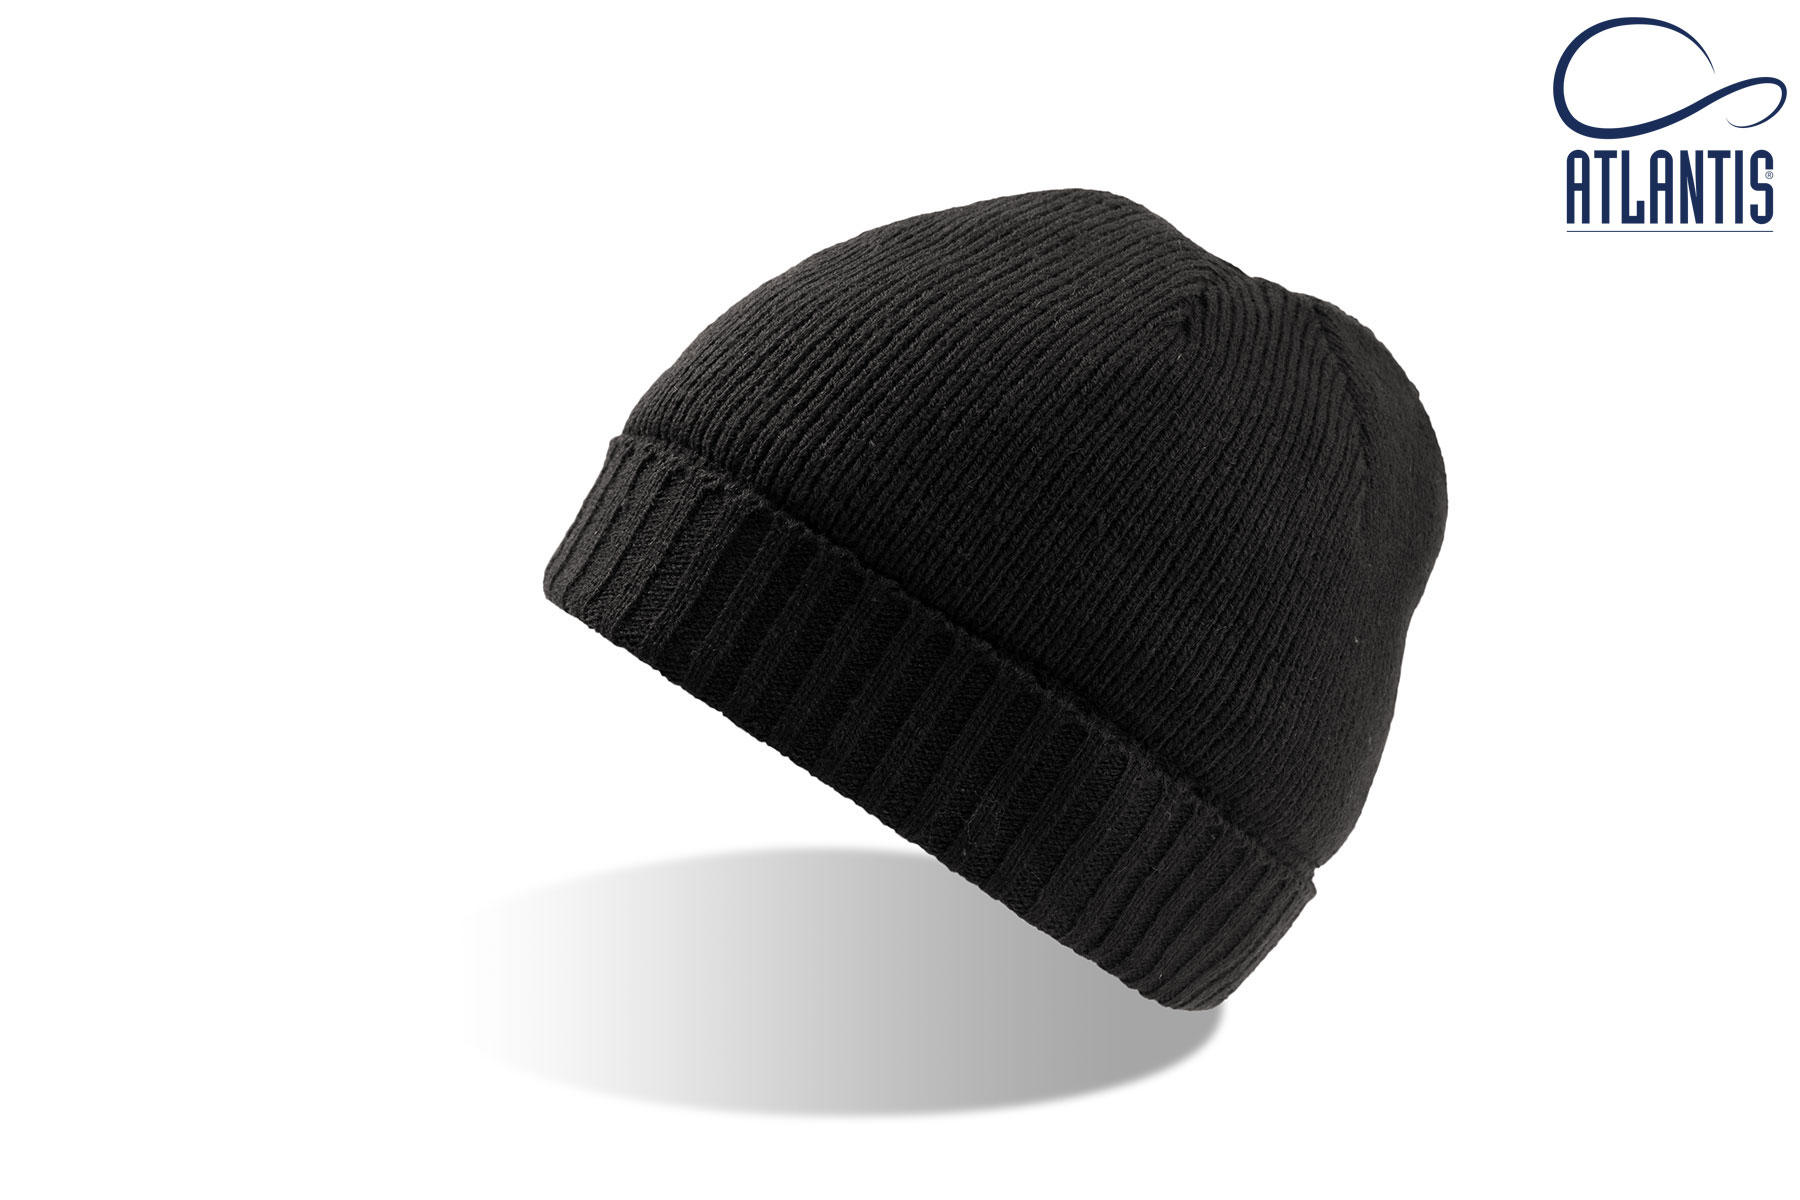 zimska kapa jack crna